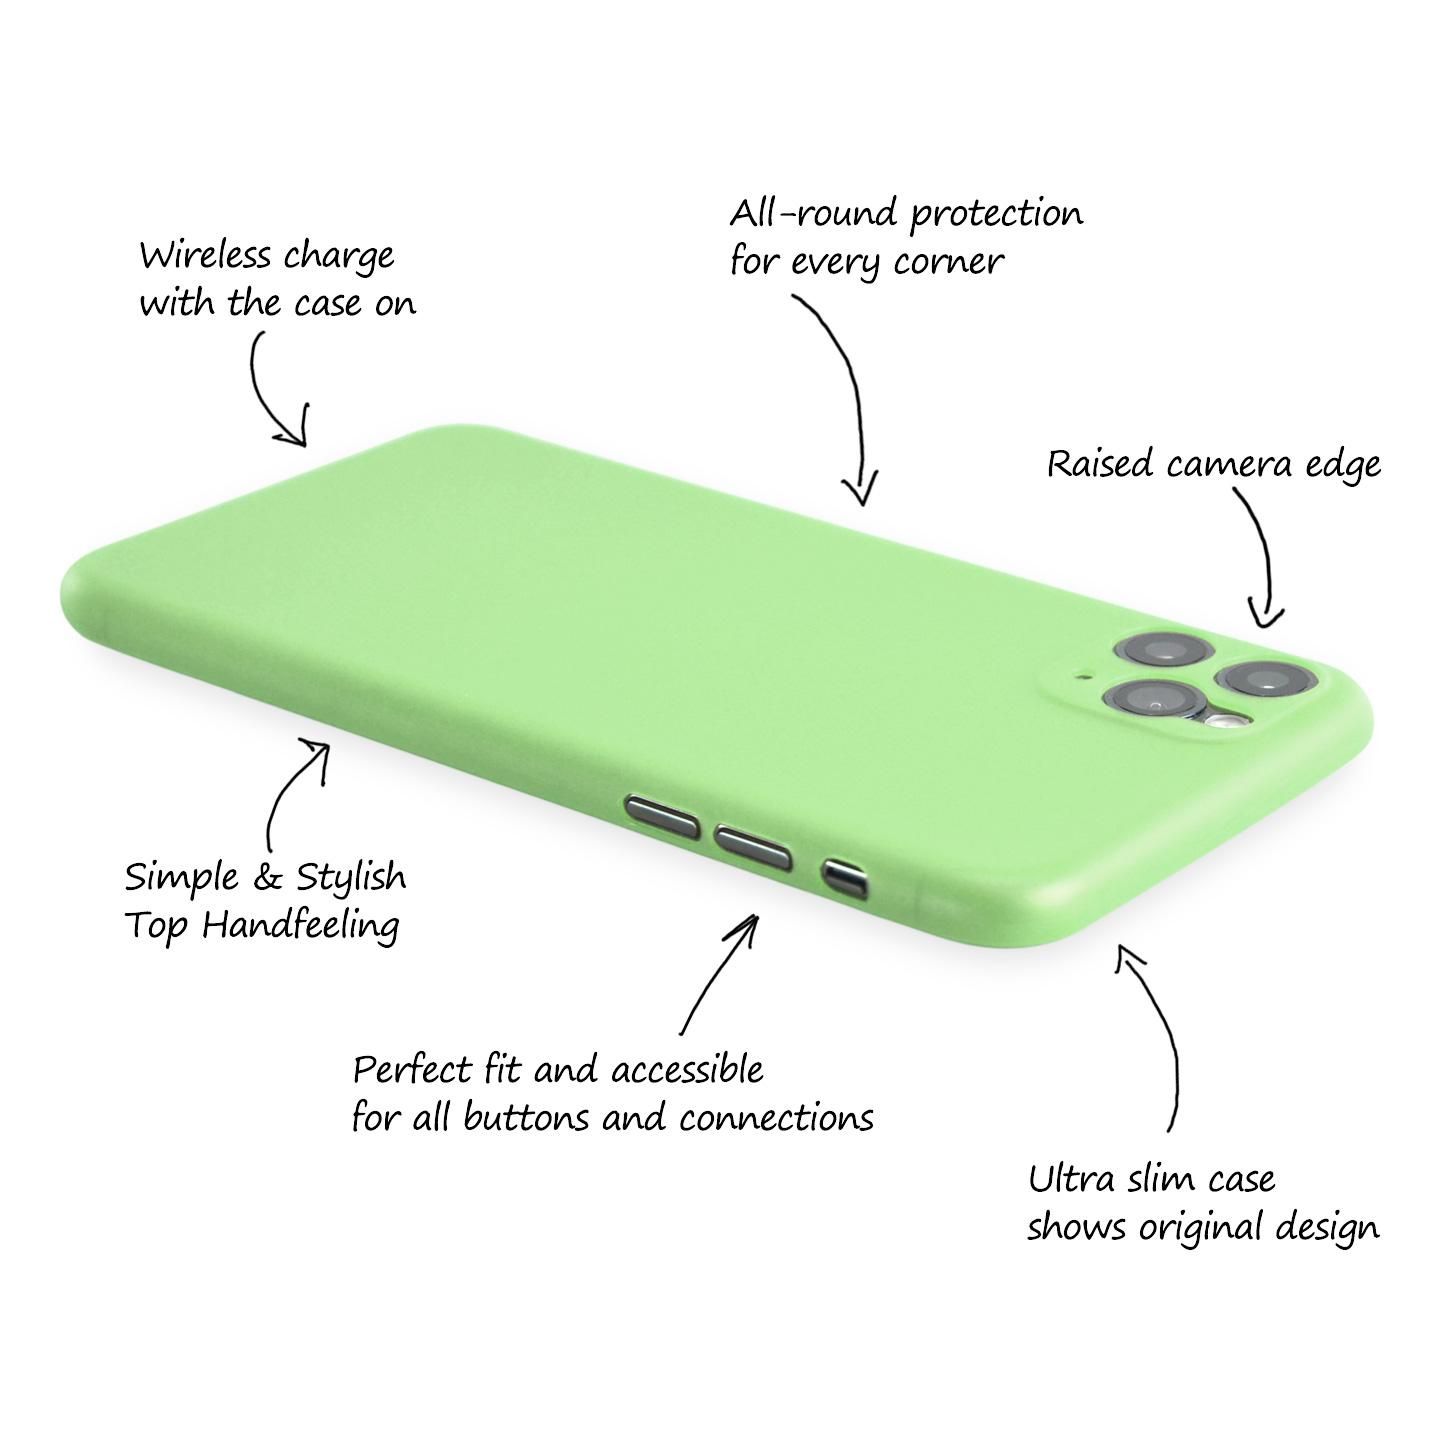 Ultra-Slim-Case-iPhone-11-Pro-5-8-034-Matt-Clear-Schutz-Huelle-Skin-Cover-Etui-Folie Indexbild 30